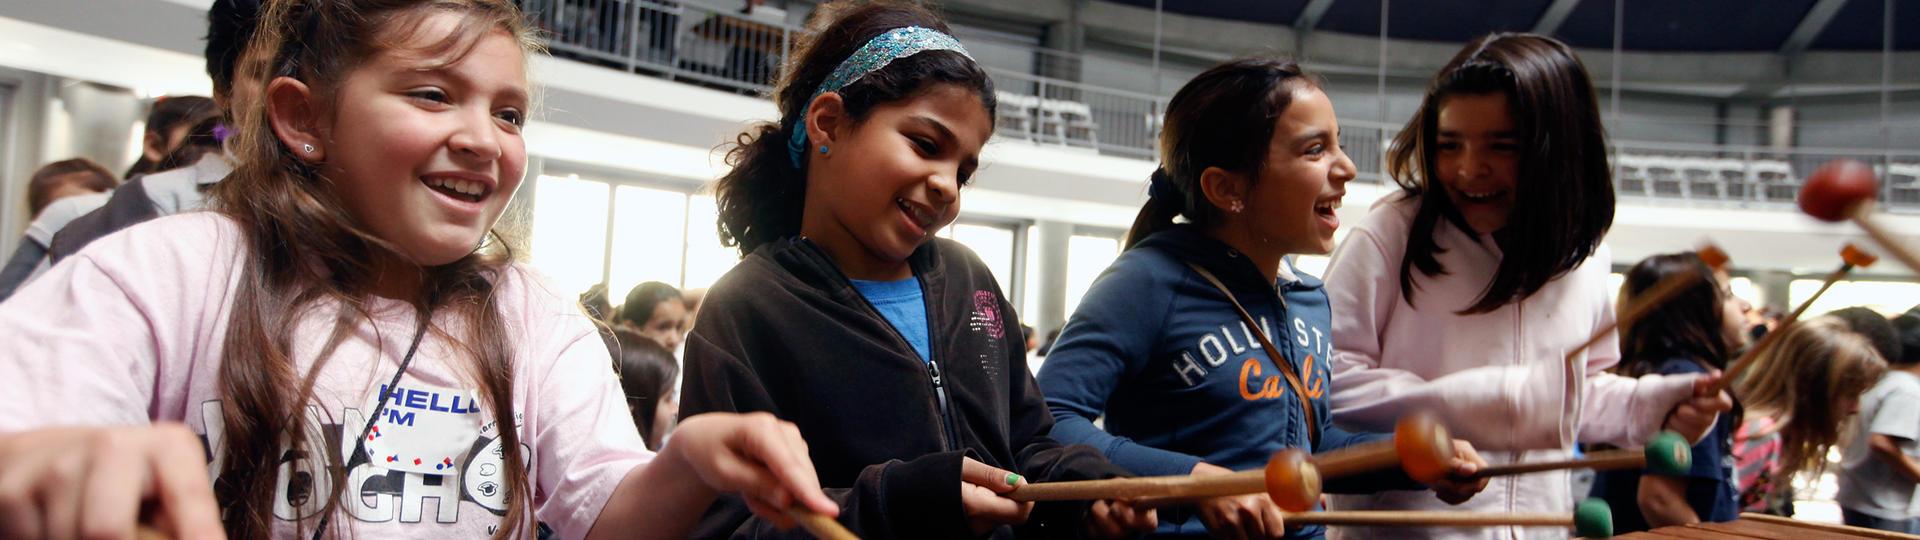 Young girls playing marimba